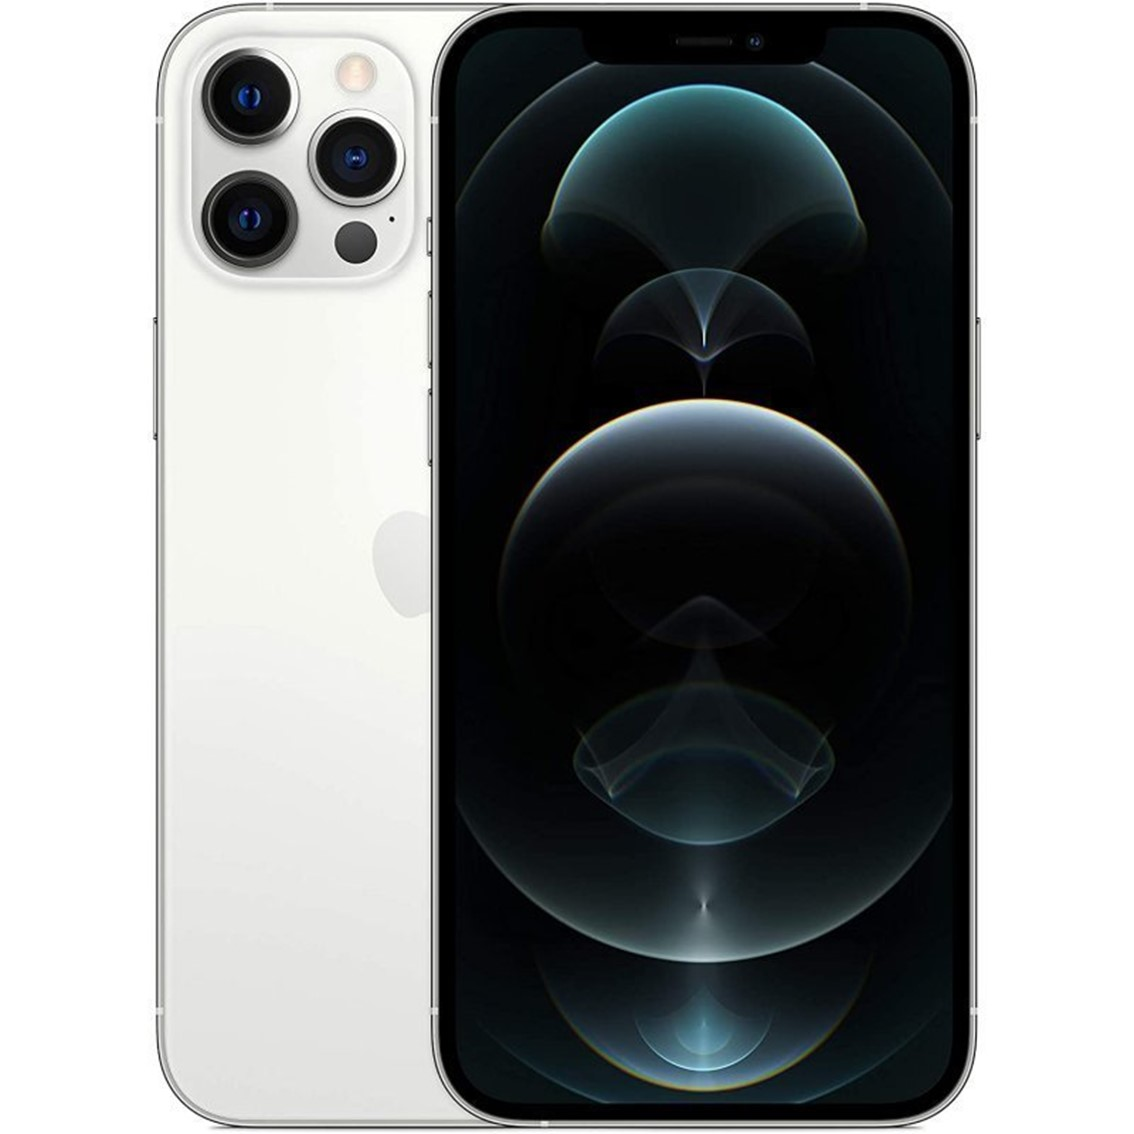 Apple iphone 12 pro max 128gb silver sin cargador - sin auriculares - a14 bionic - 12mpx - 6.7 mgd83ql - a